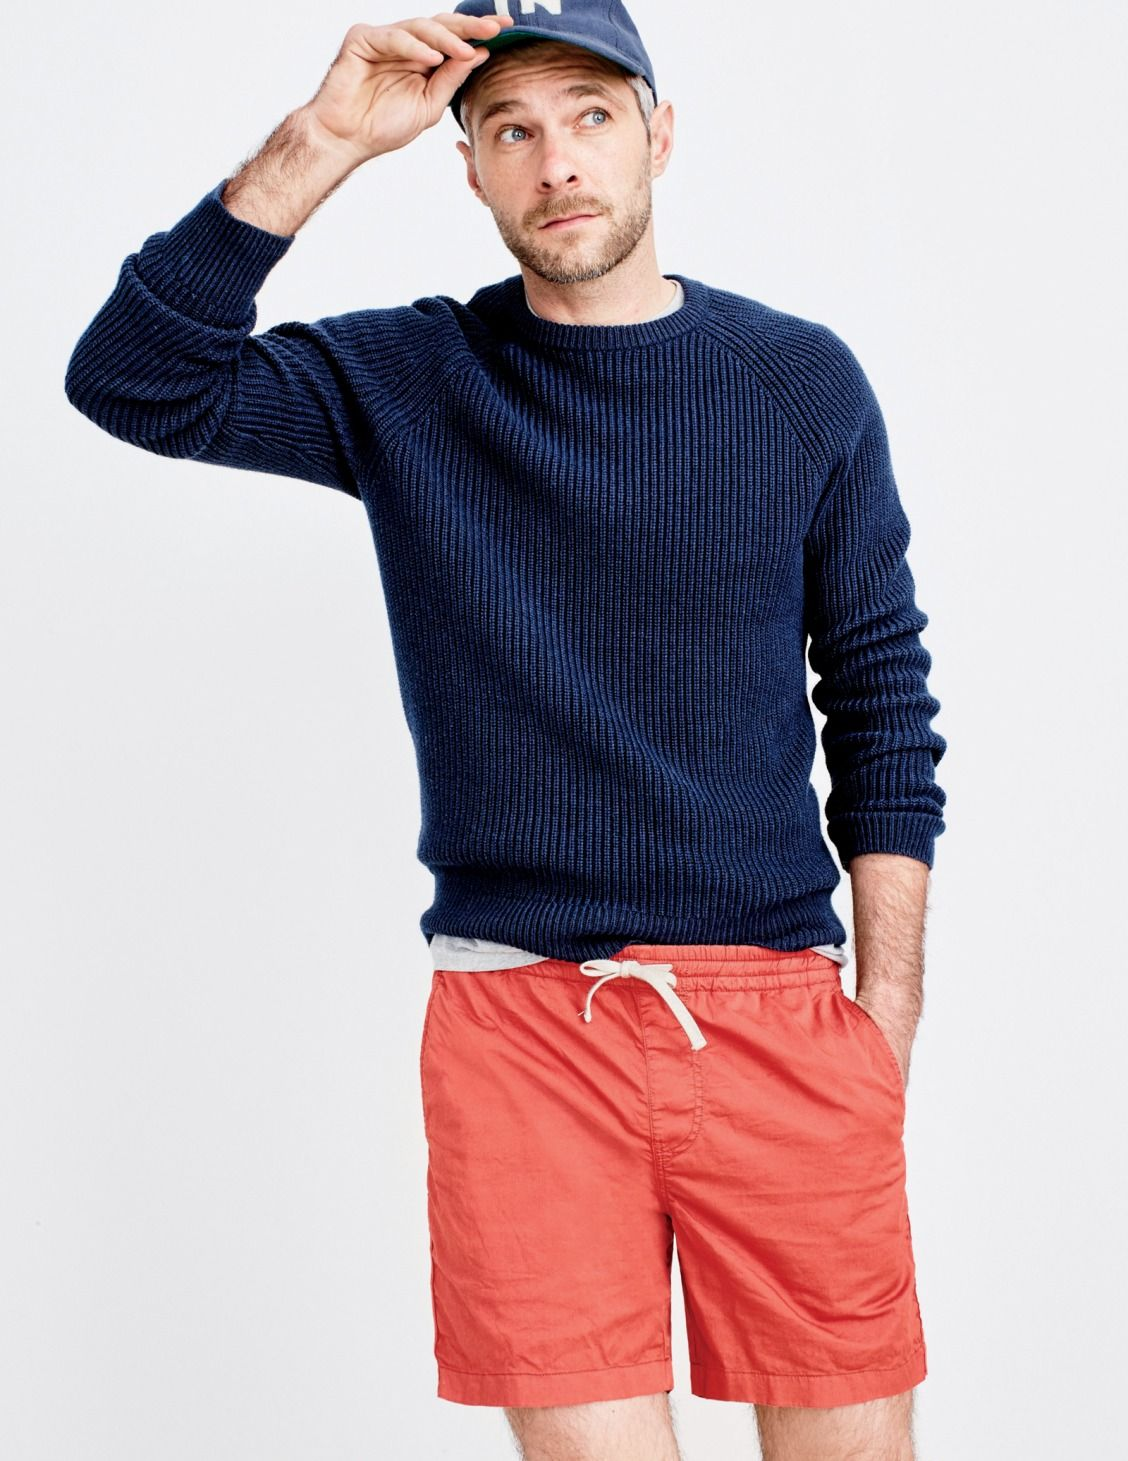 497018589bc2 J.Crew men s raglan-sleeve crewneck sweater